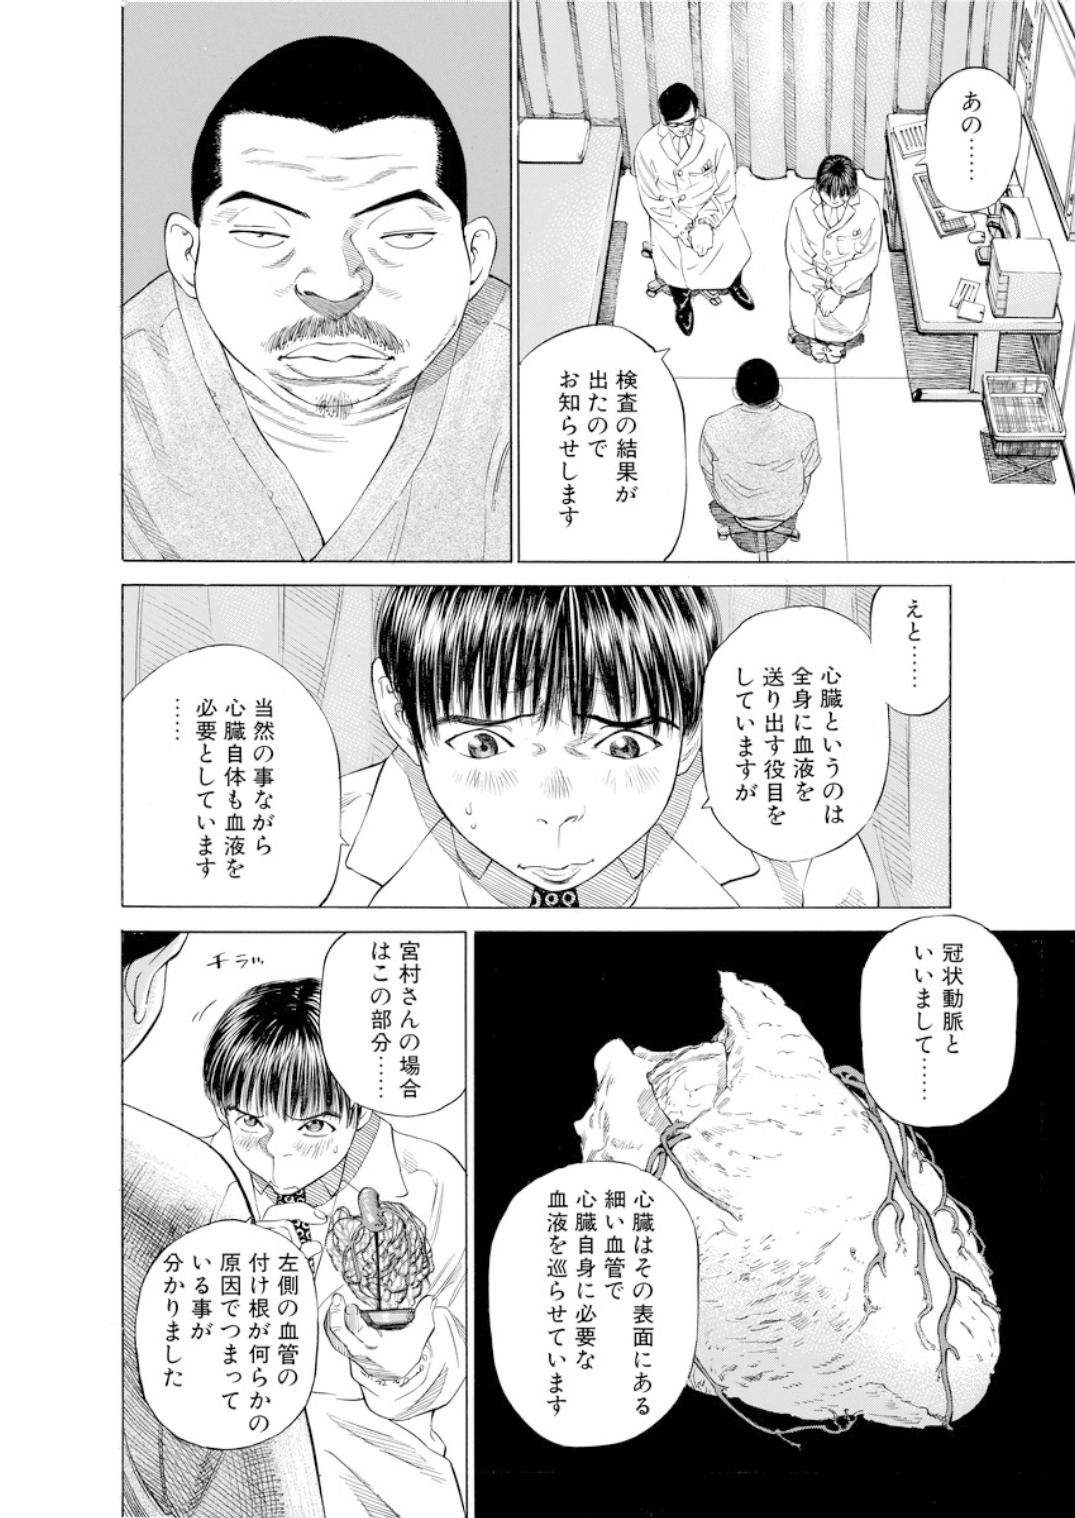 001bj_page-0176.jpg